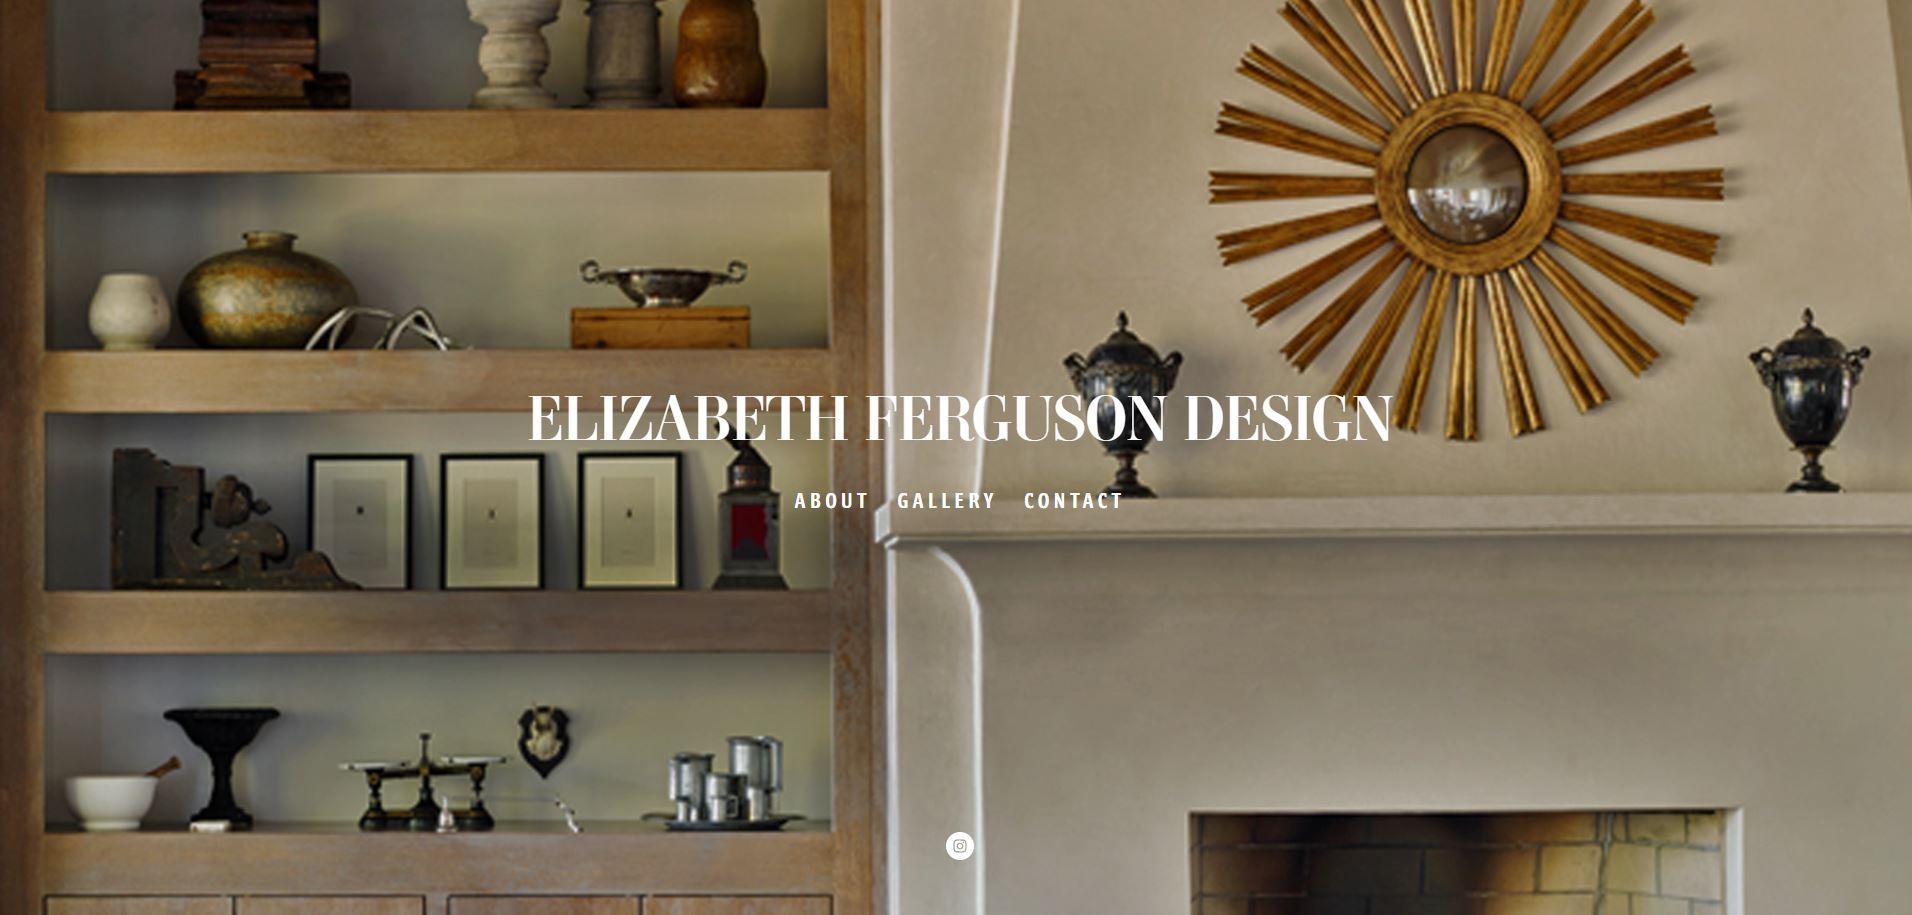 Elizabeth Furguson Design